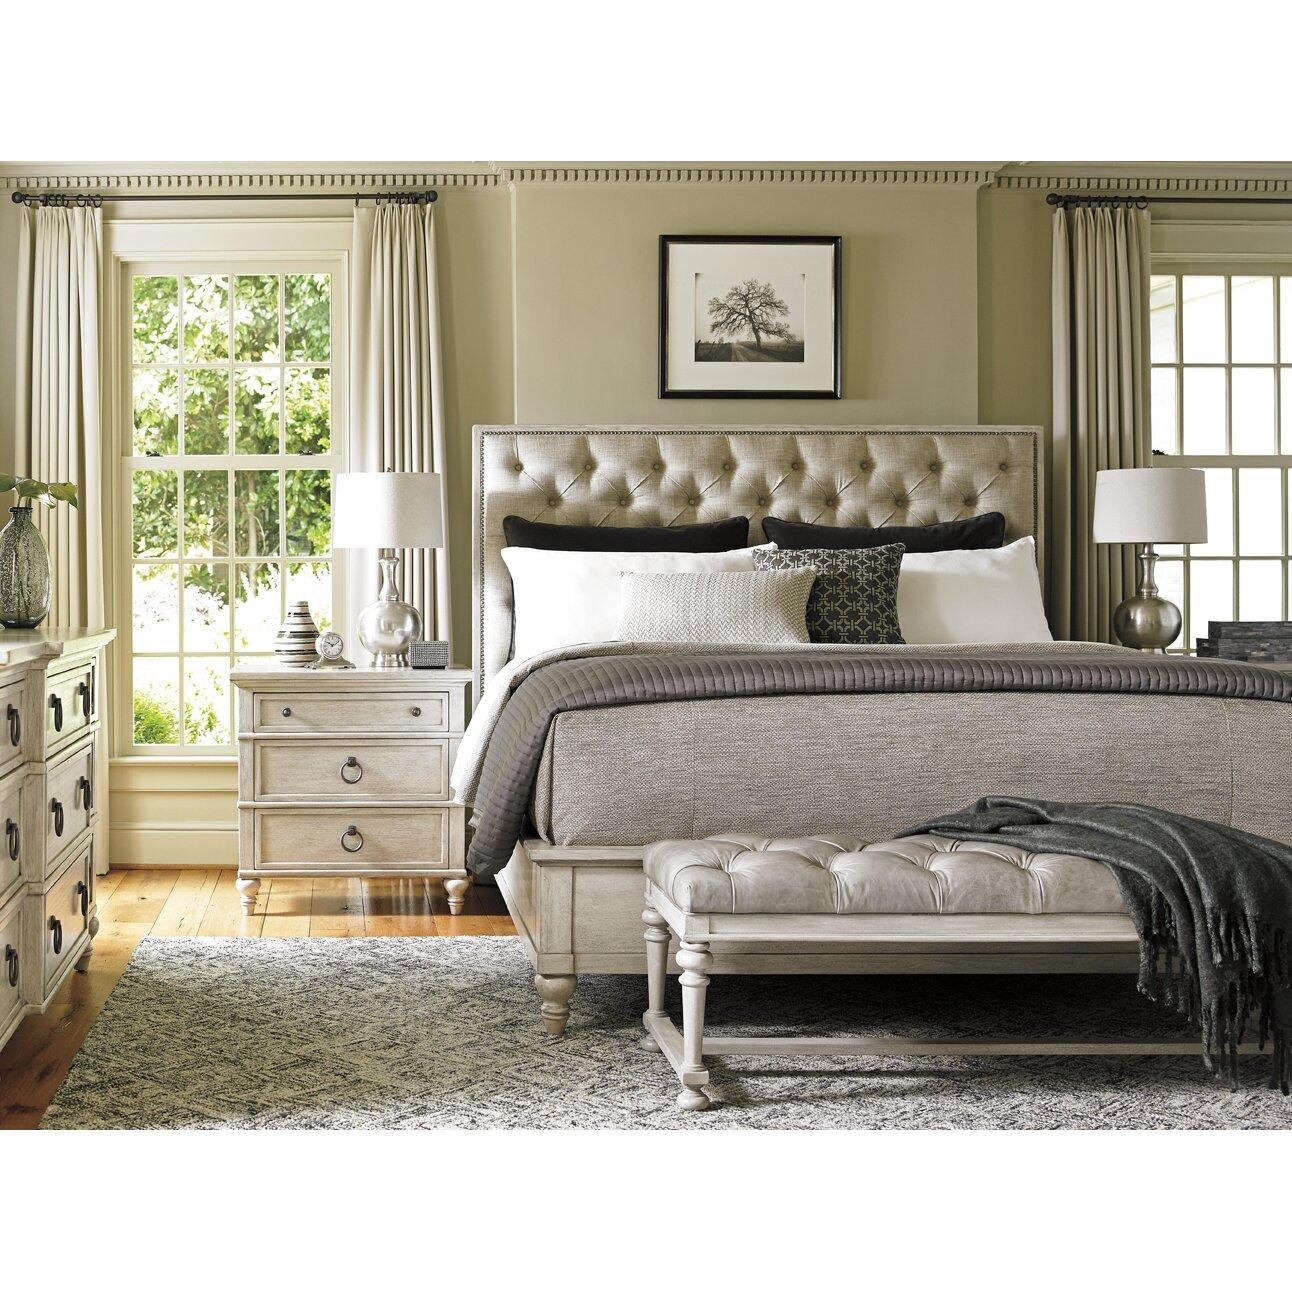 Lexington oyster bay upholstery platform customizable for Bedroom furniture upholstered beds